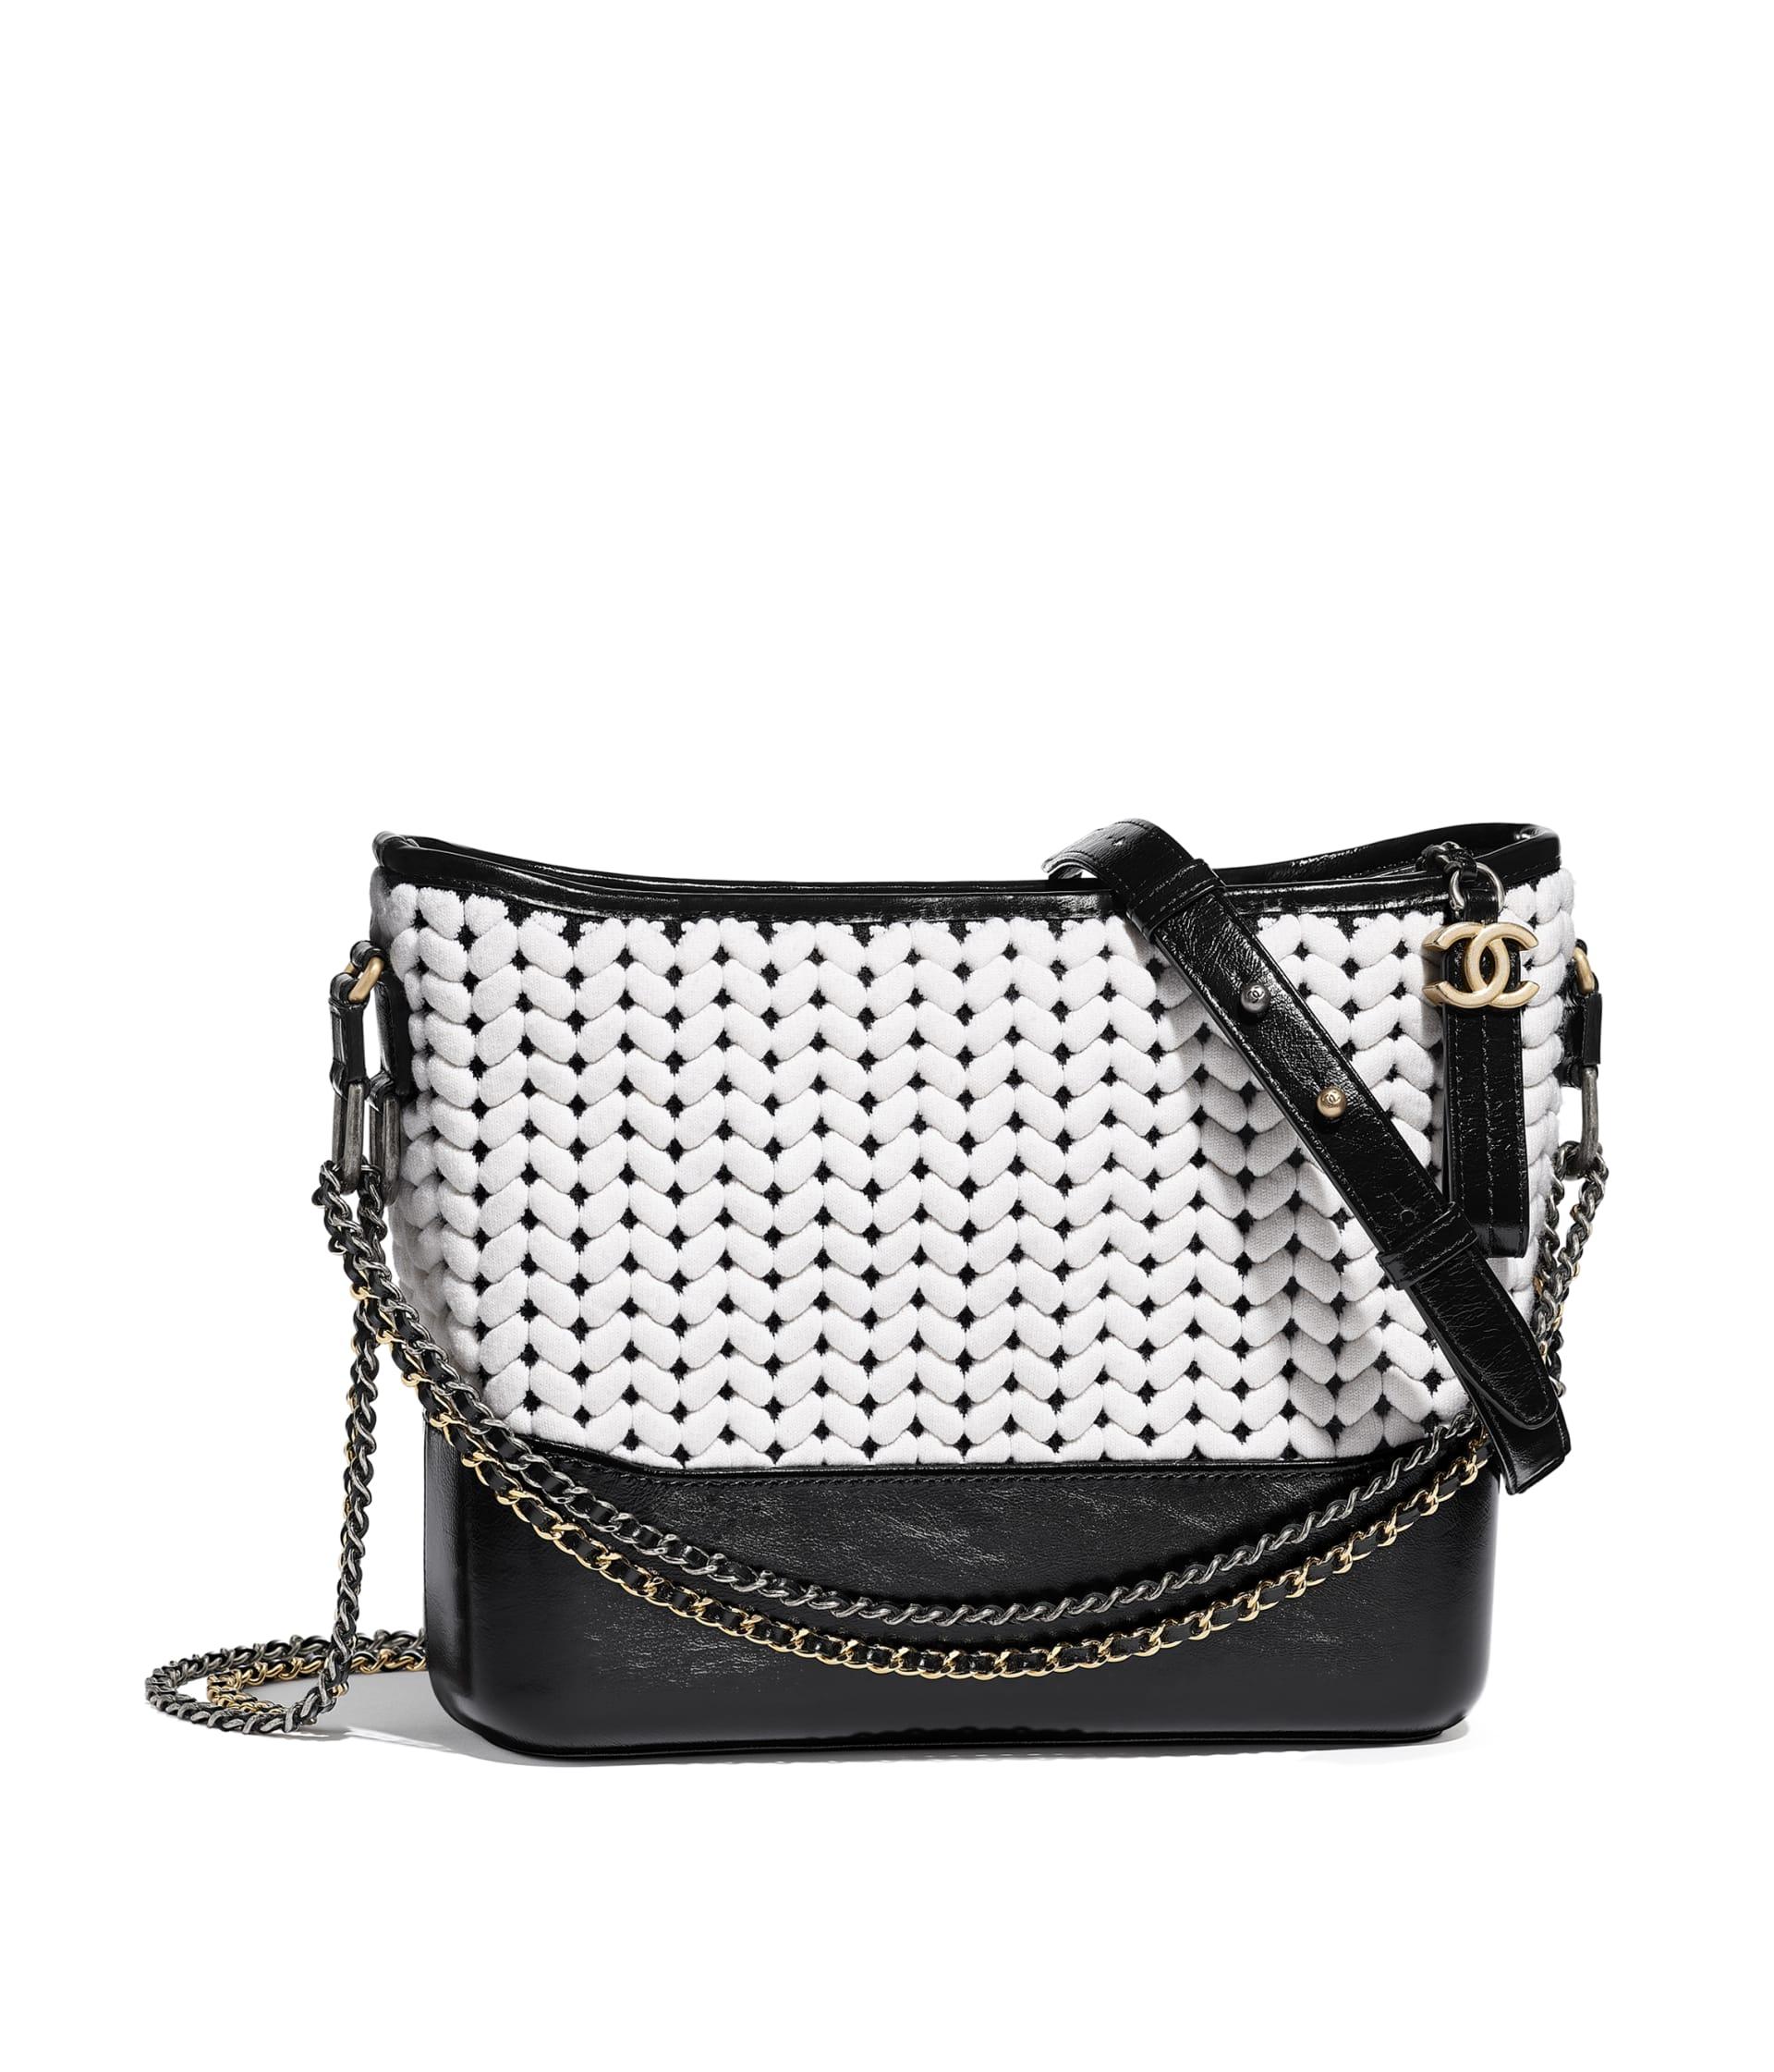 image 1 - CHANEL'S GABRIELLE  Large Hobo Bag - Wool, Calfskin, Gold-Tone & Silver-Tone Metal - White & Black